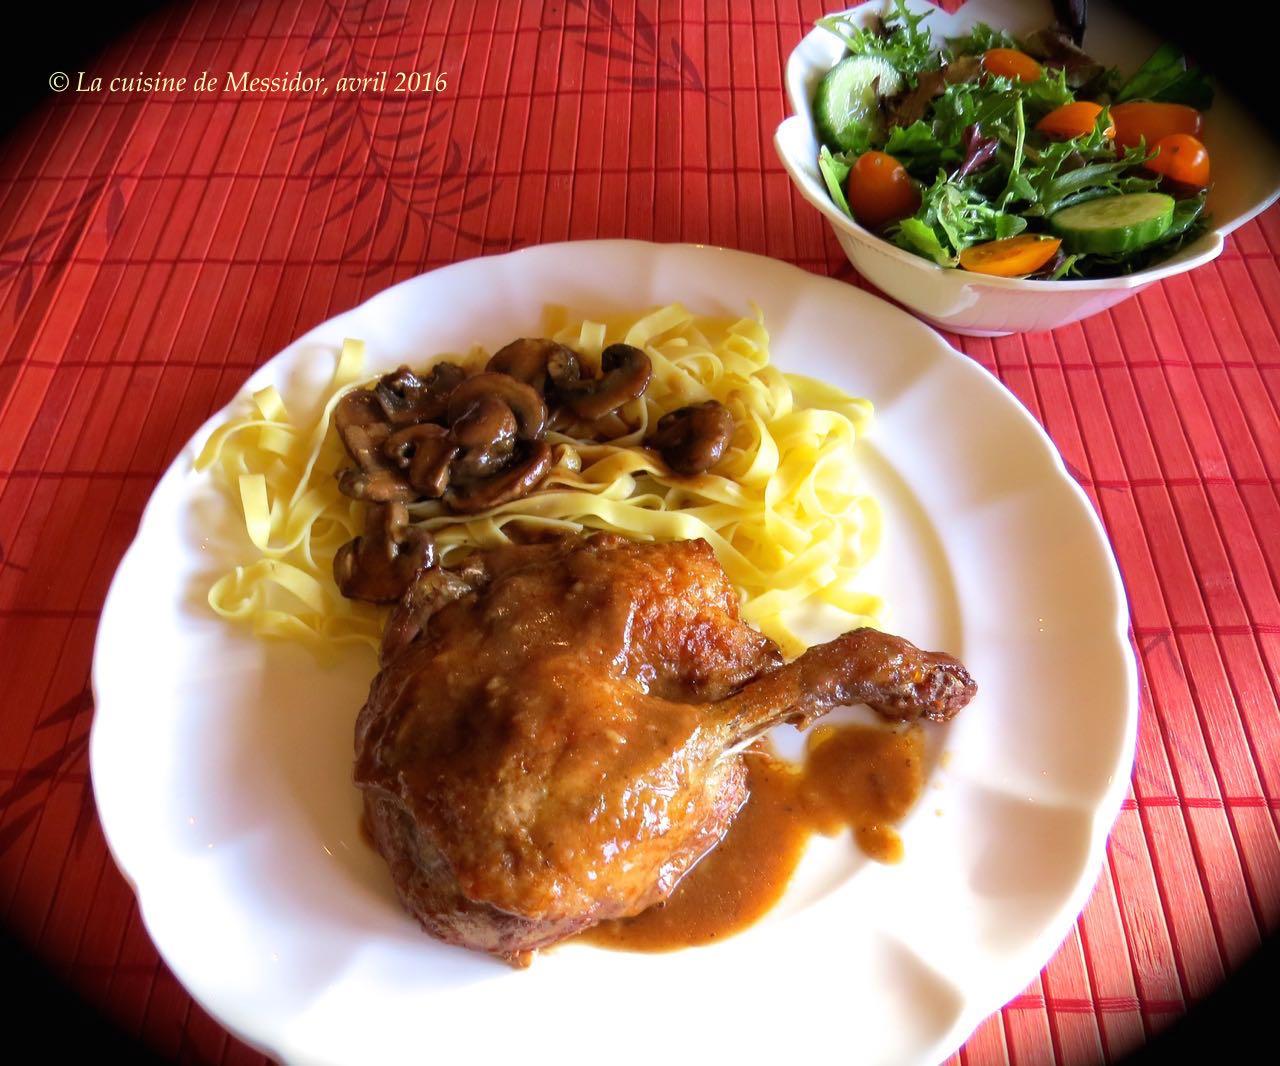 La cuisine de messidor cuisses de canard brais es sauce barbecue - Cuisse de canard en sauce ...